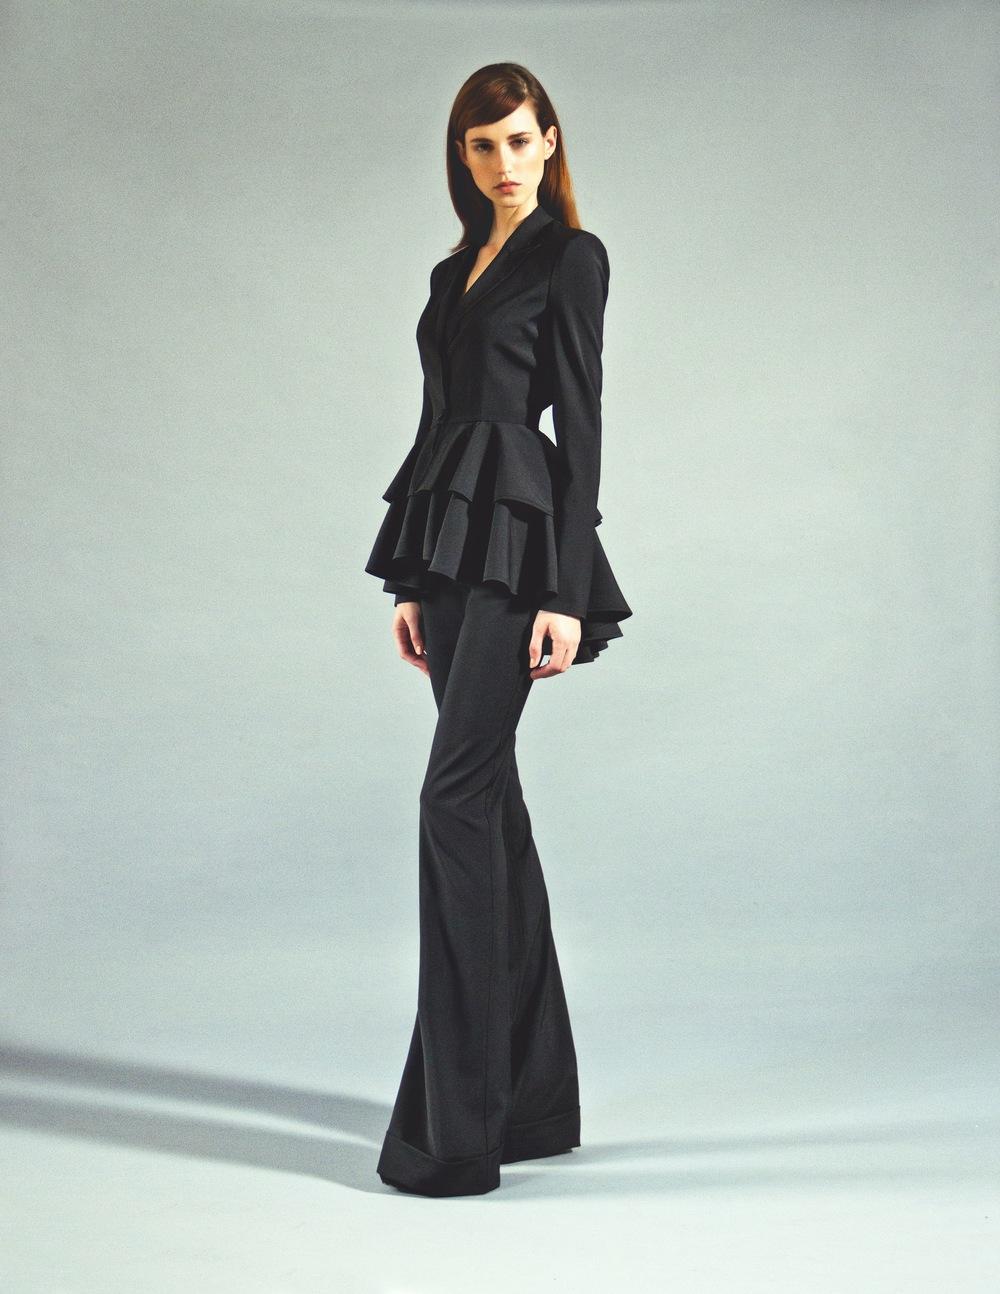 Reddoll SS14 Suit.jpg